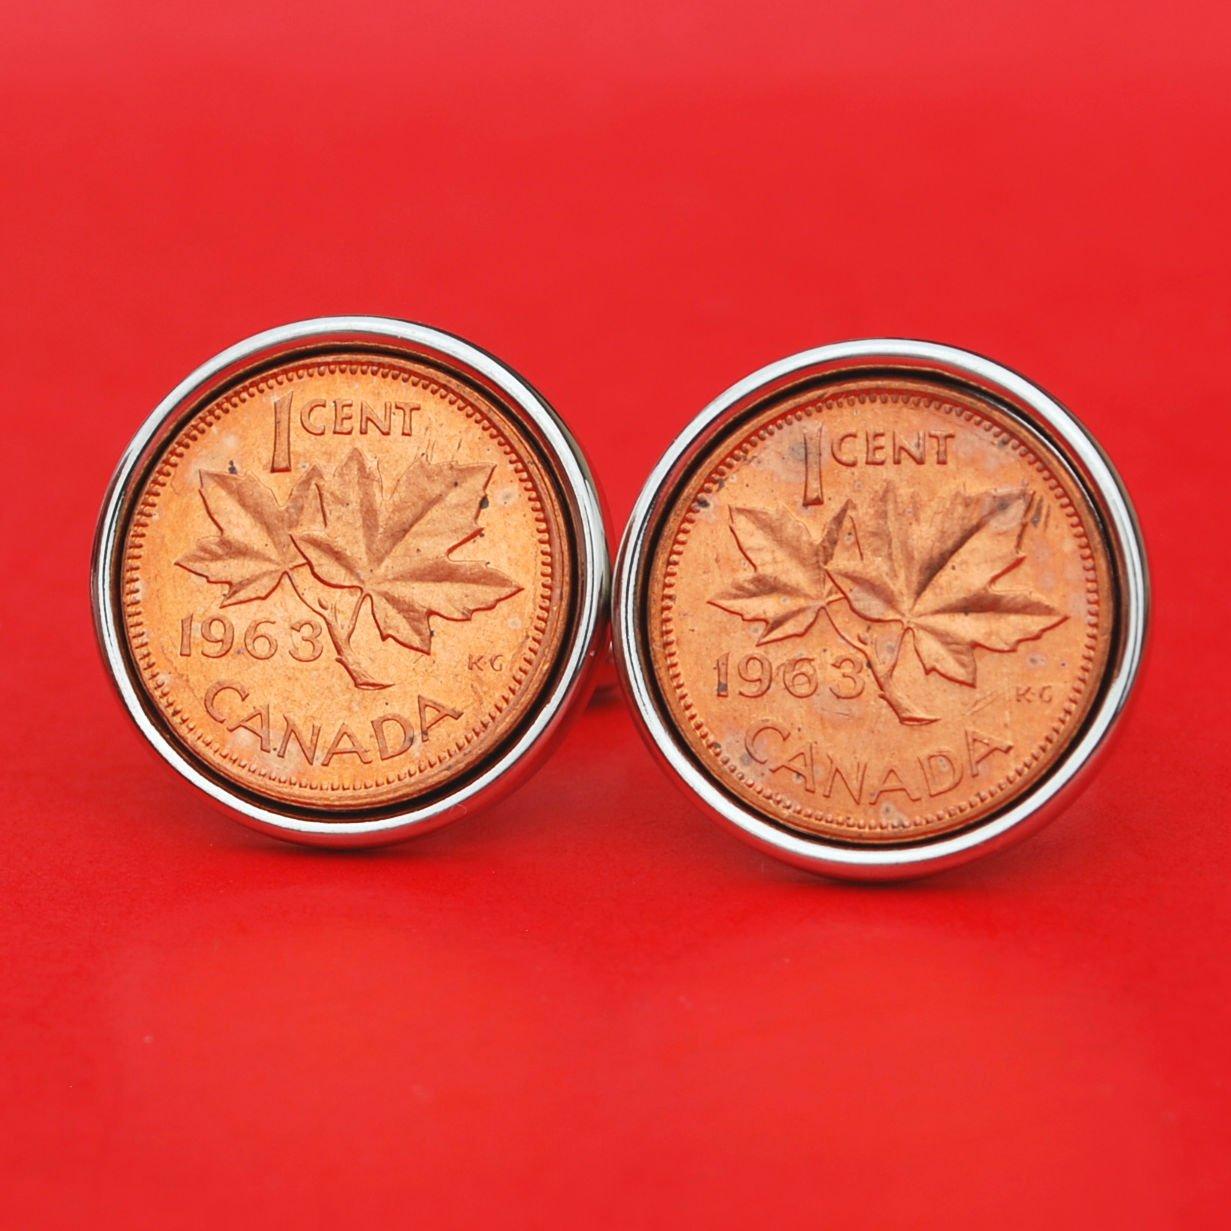 1963 Canada One Cent BU Uncirculated Coin Cufflinks NEW - Maple Leaf